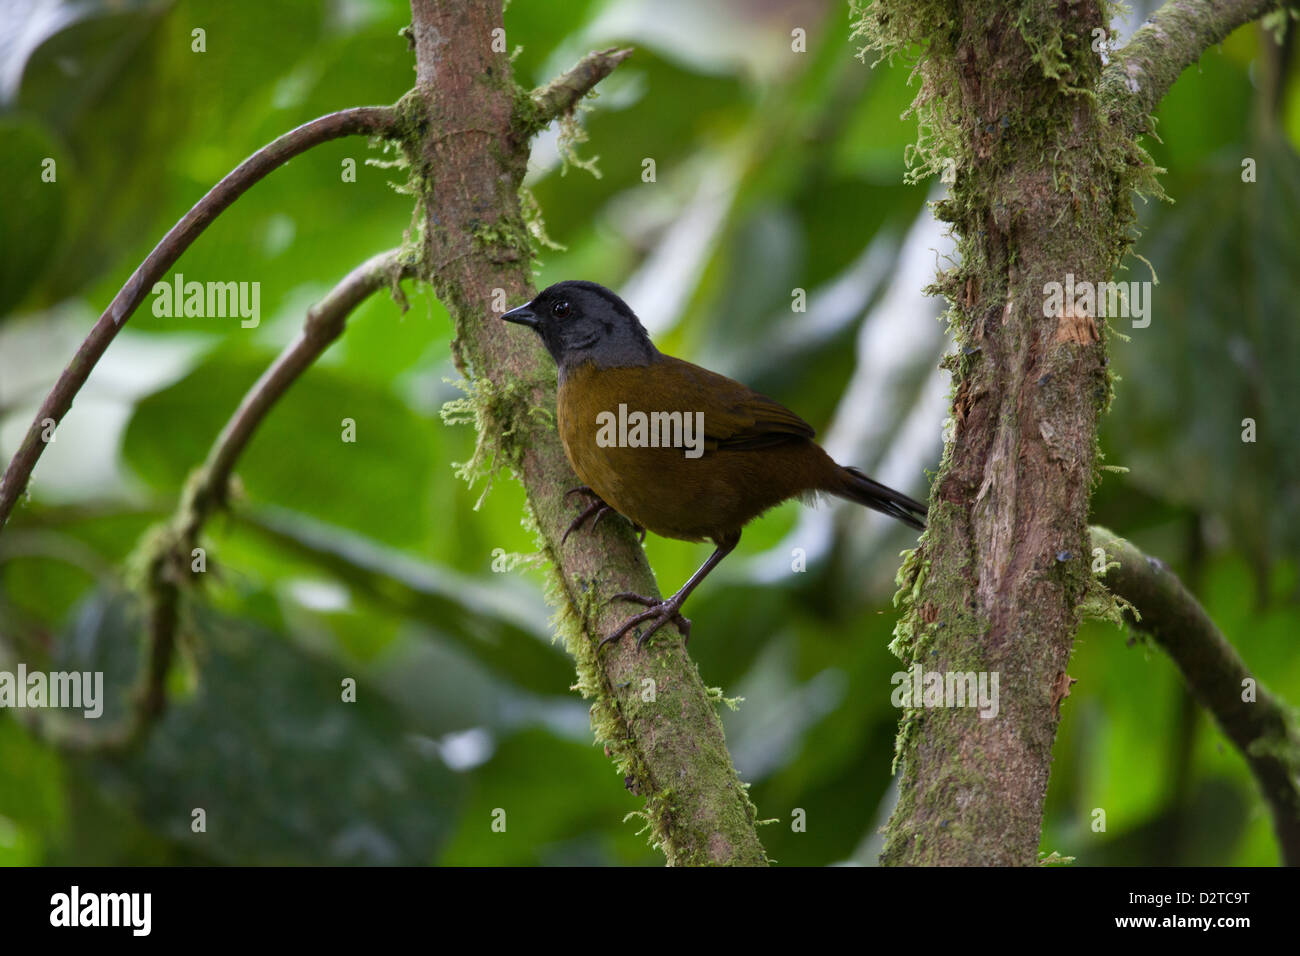 Large-footed Finch, Pezopetes capitalis, in La Amistad national park, Chiriqui province, Republic of Panama. Stock Photo